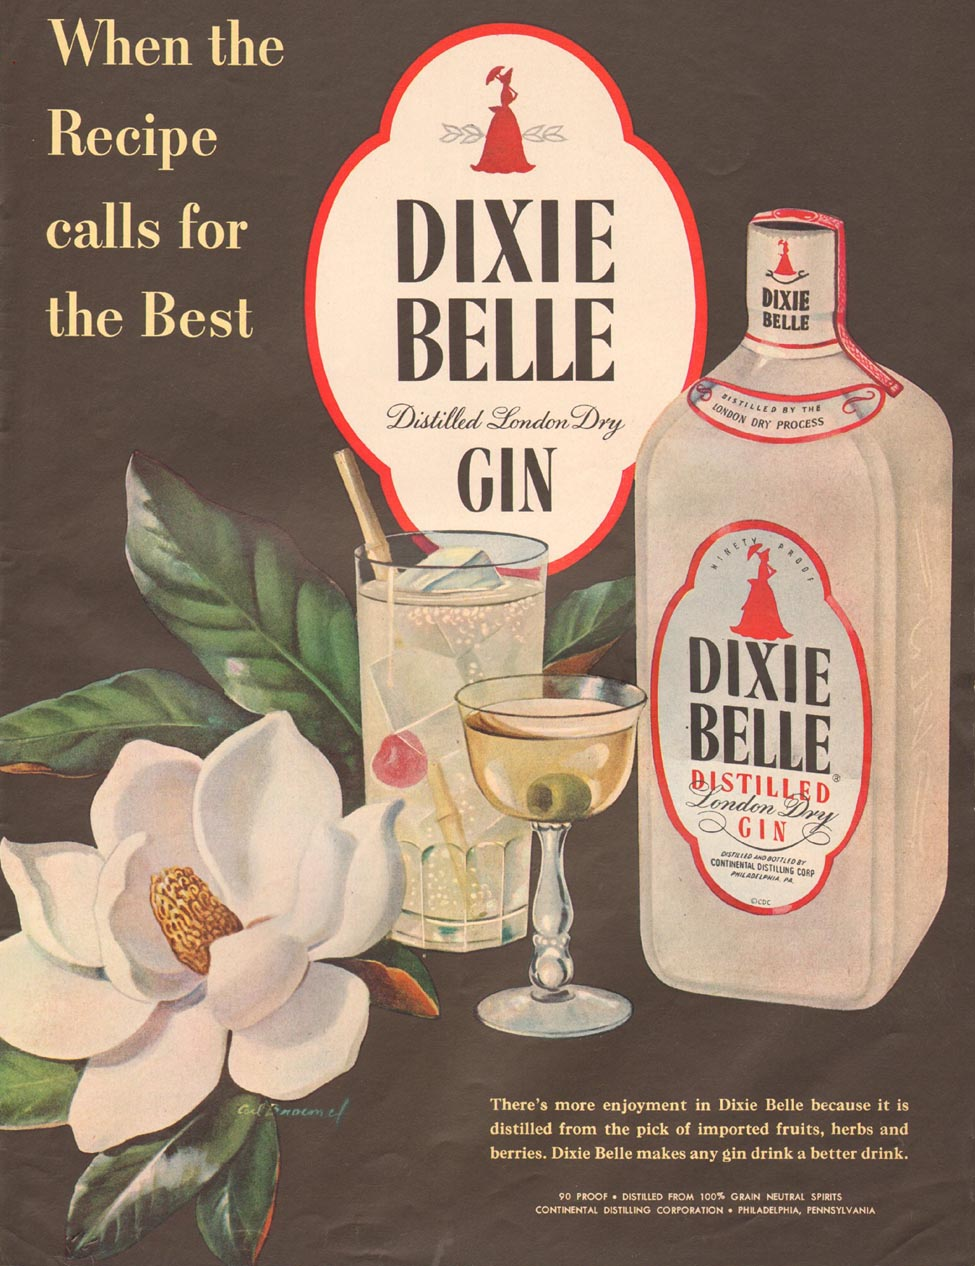 DIXIE BELLE DISTILLED GIN LIFE 04/30/1951 p. 83